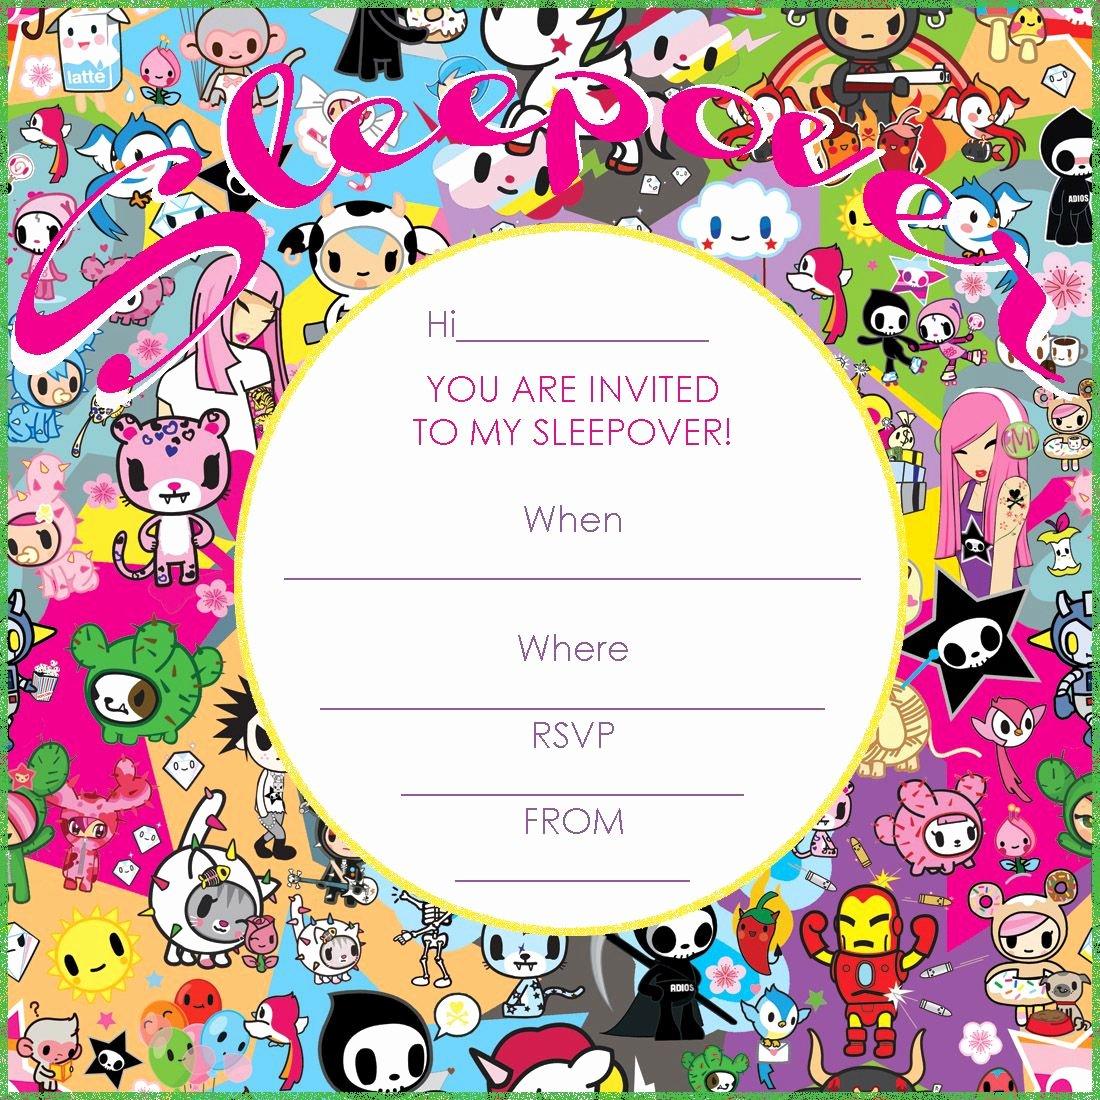 Free Sleepover Invitation Template Lovely tokidoki Birthday Party